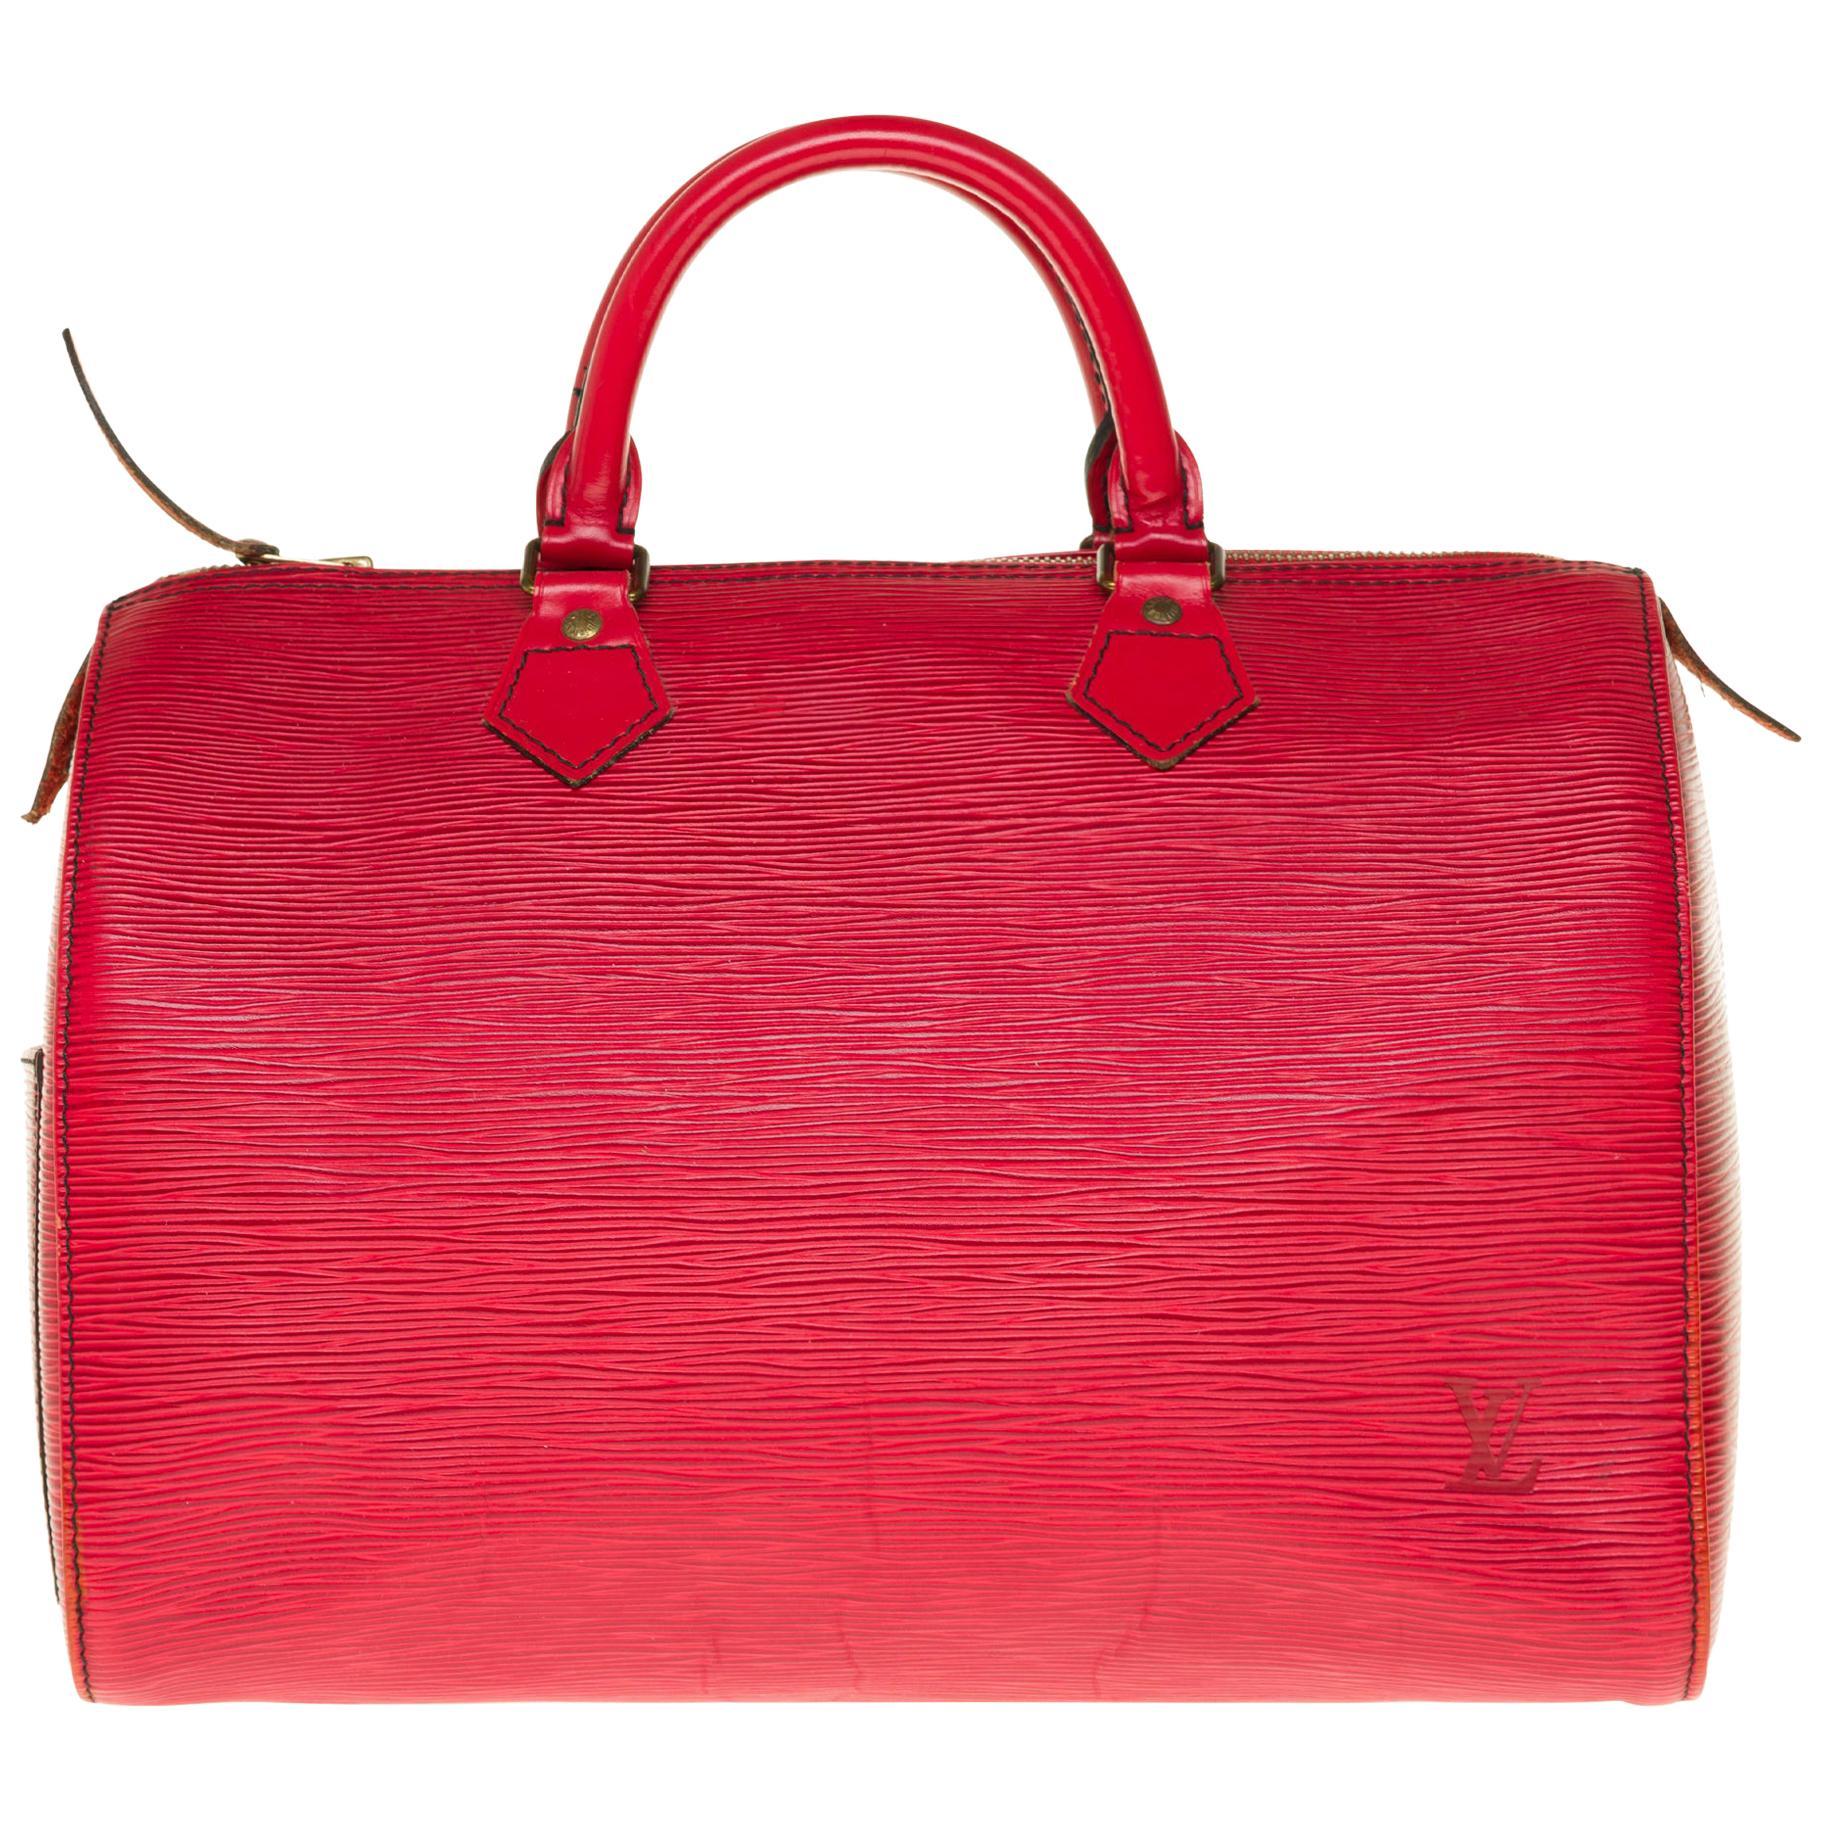 Louis Vuitton Speedy 35 handbag in red épi leather